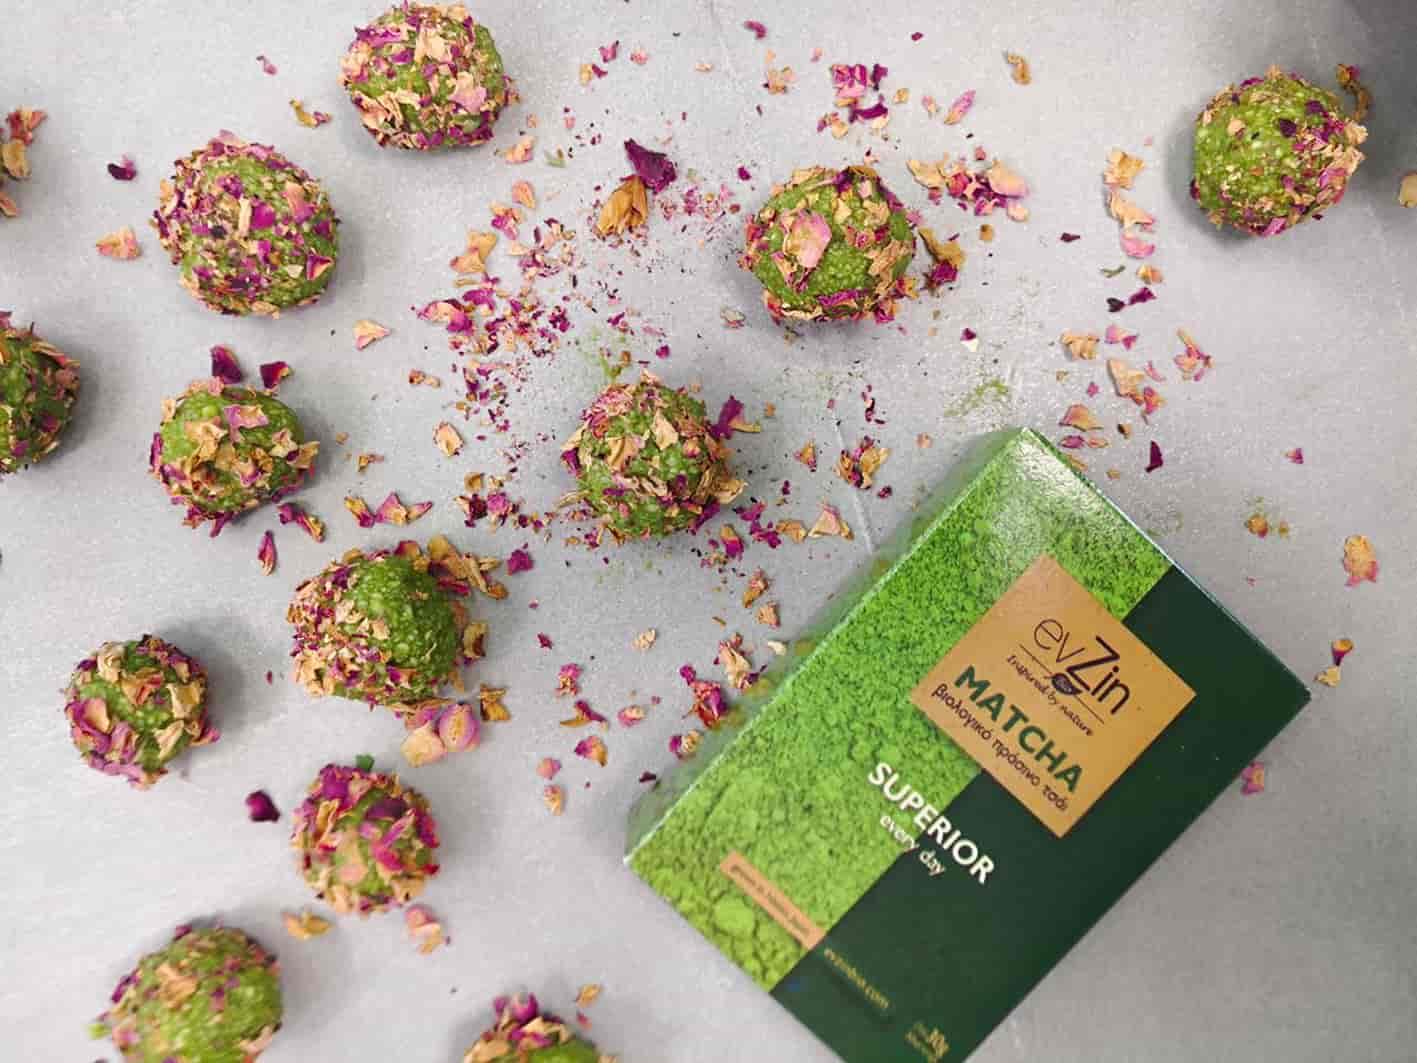 Amygdalota-almond-truffles-matcha-rose-petals-6-recipe-dessert